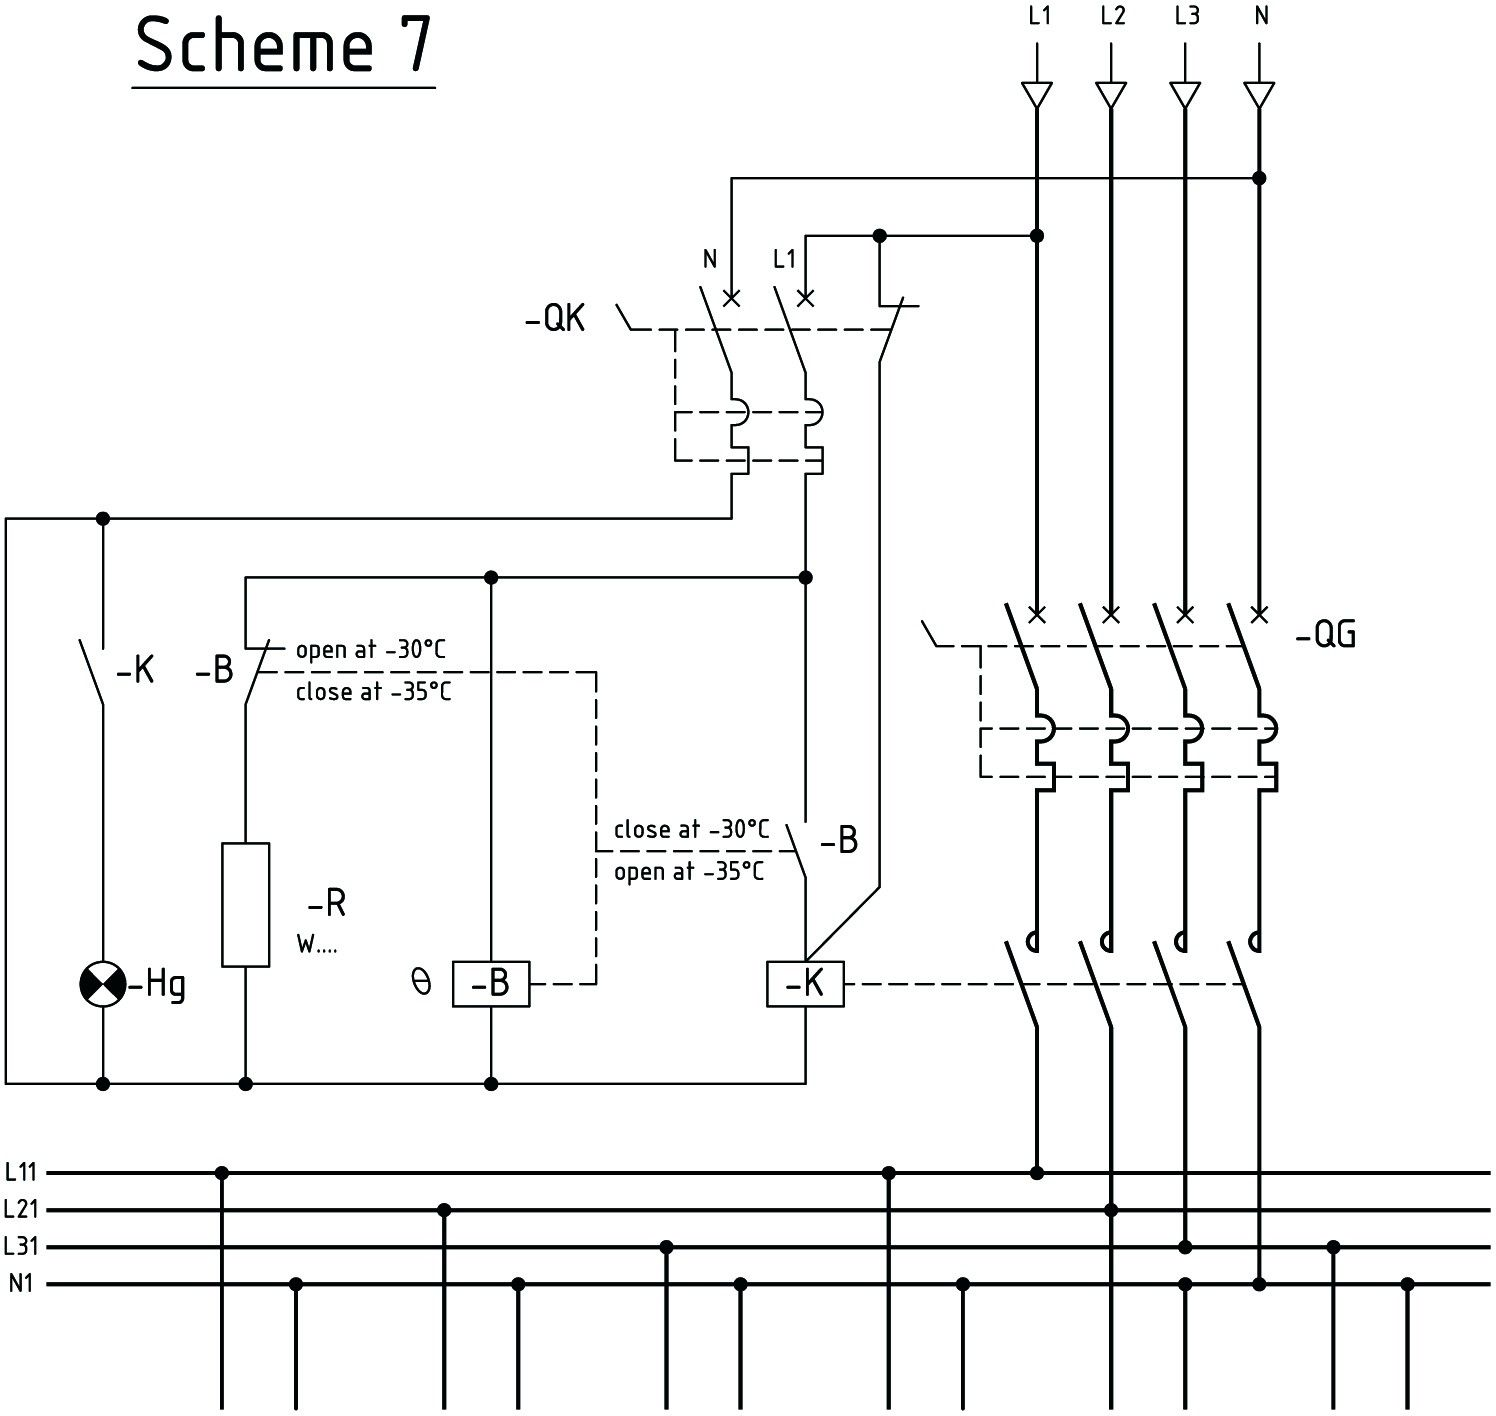 wiring diagram circuit breaker blurts me rh blurts me 4 pole breaker wiring diagram breaker box wiring diagram [ 1496 x 1416 Pixel ]